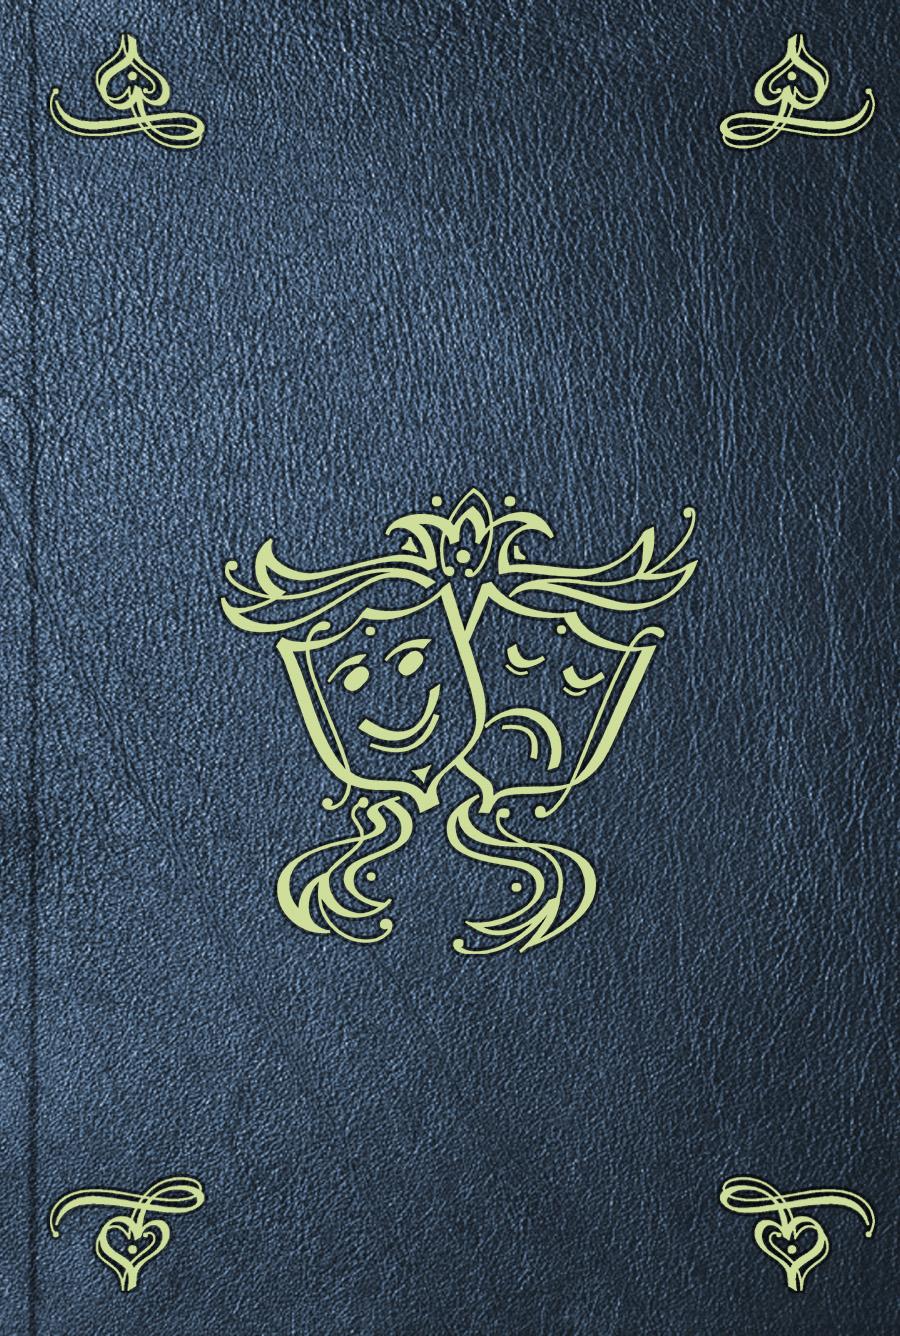 Фото - Жан-Батист Мольер Le Tartuffe, ou L'imposteur molière frederick anderson l avare comedie en cinq actes et en prose